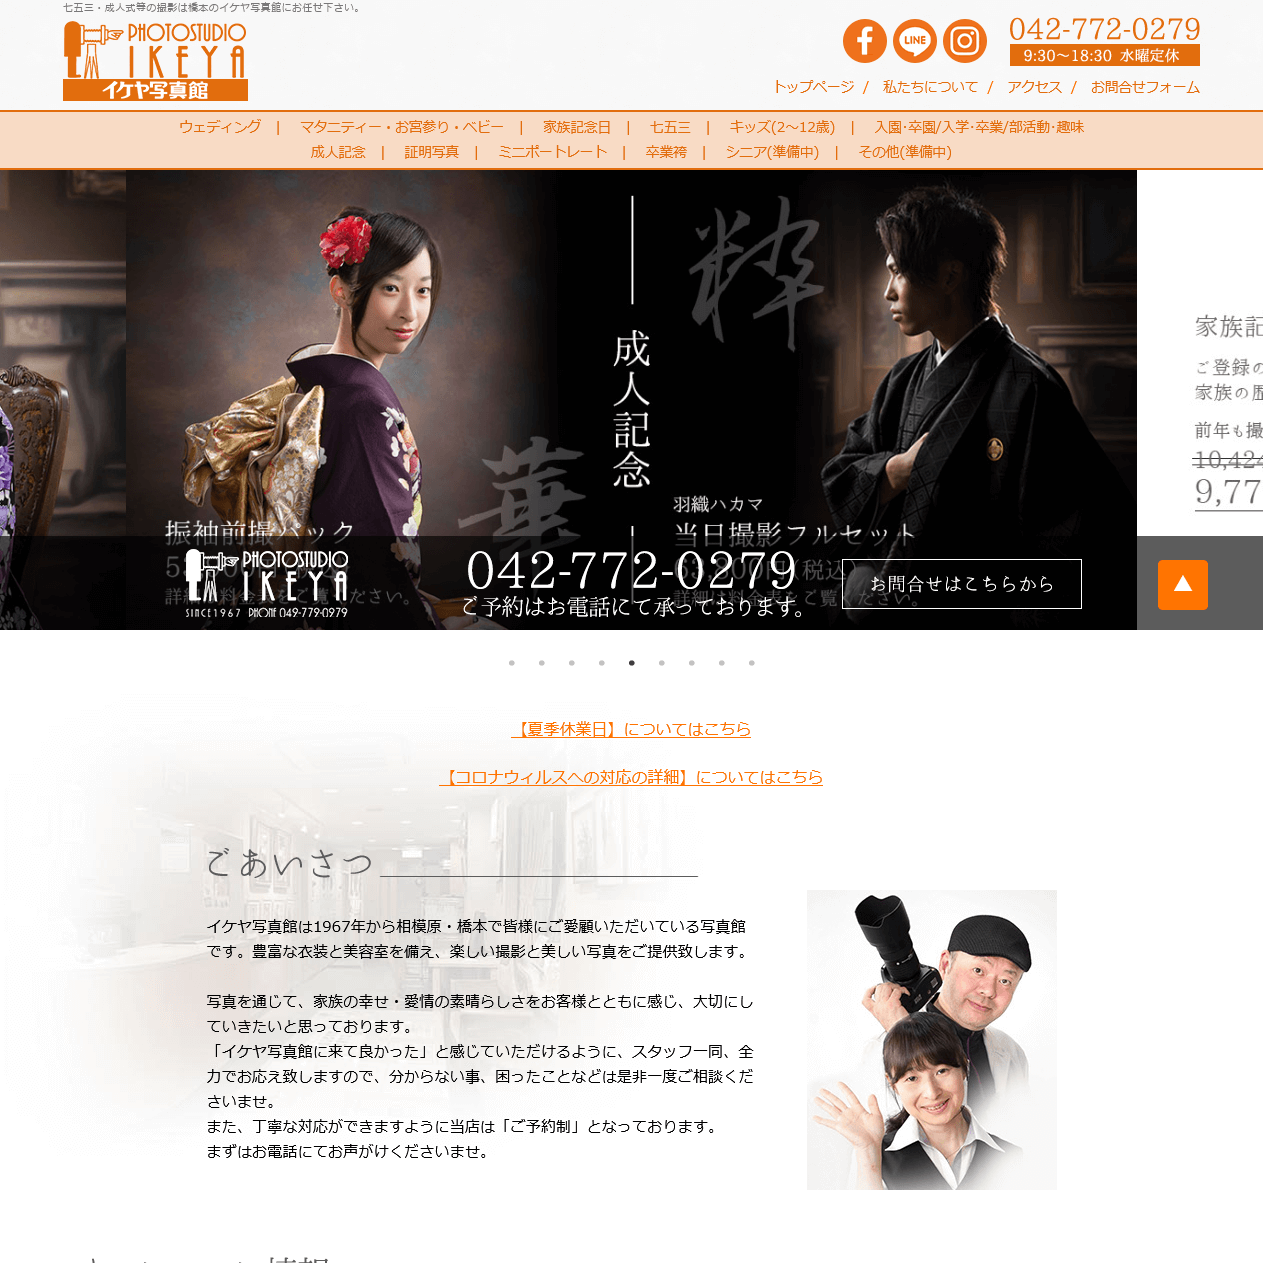 "<span class=""title"">イケヤ写真館の口コミや評判</span>"